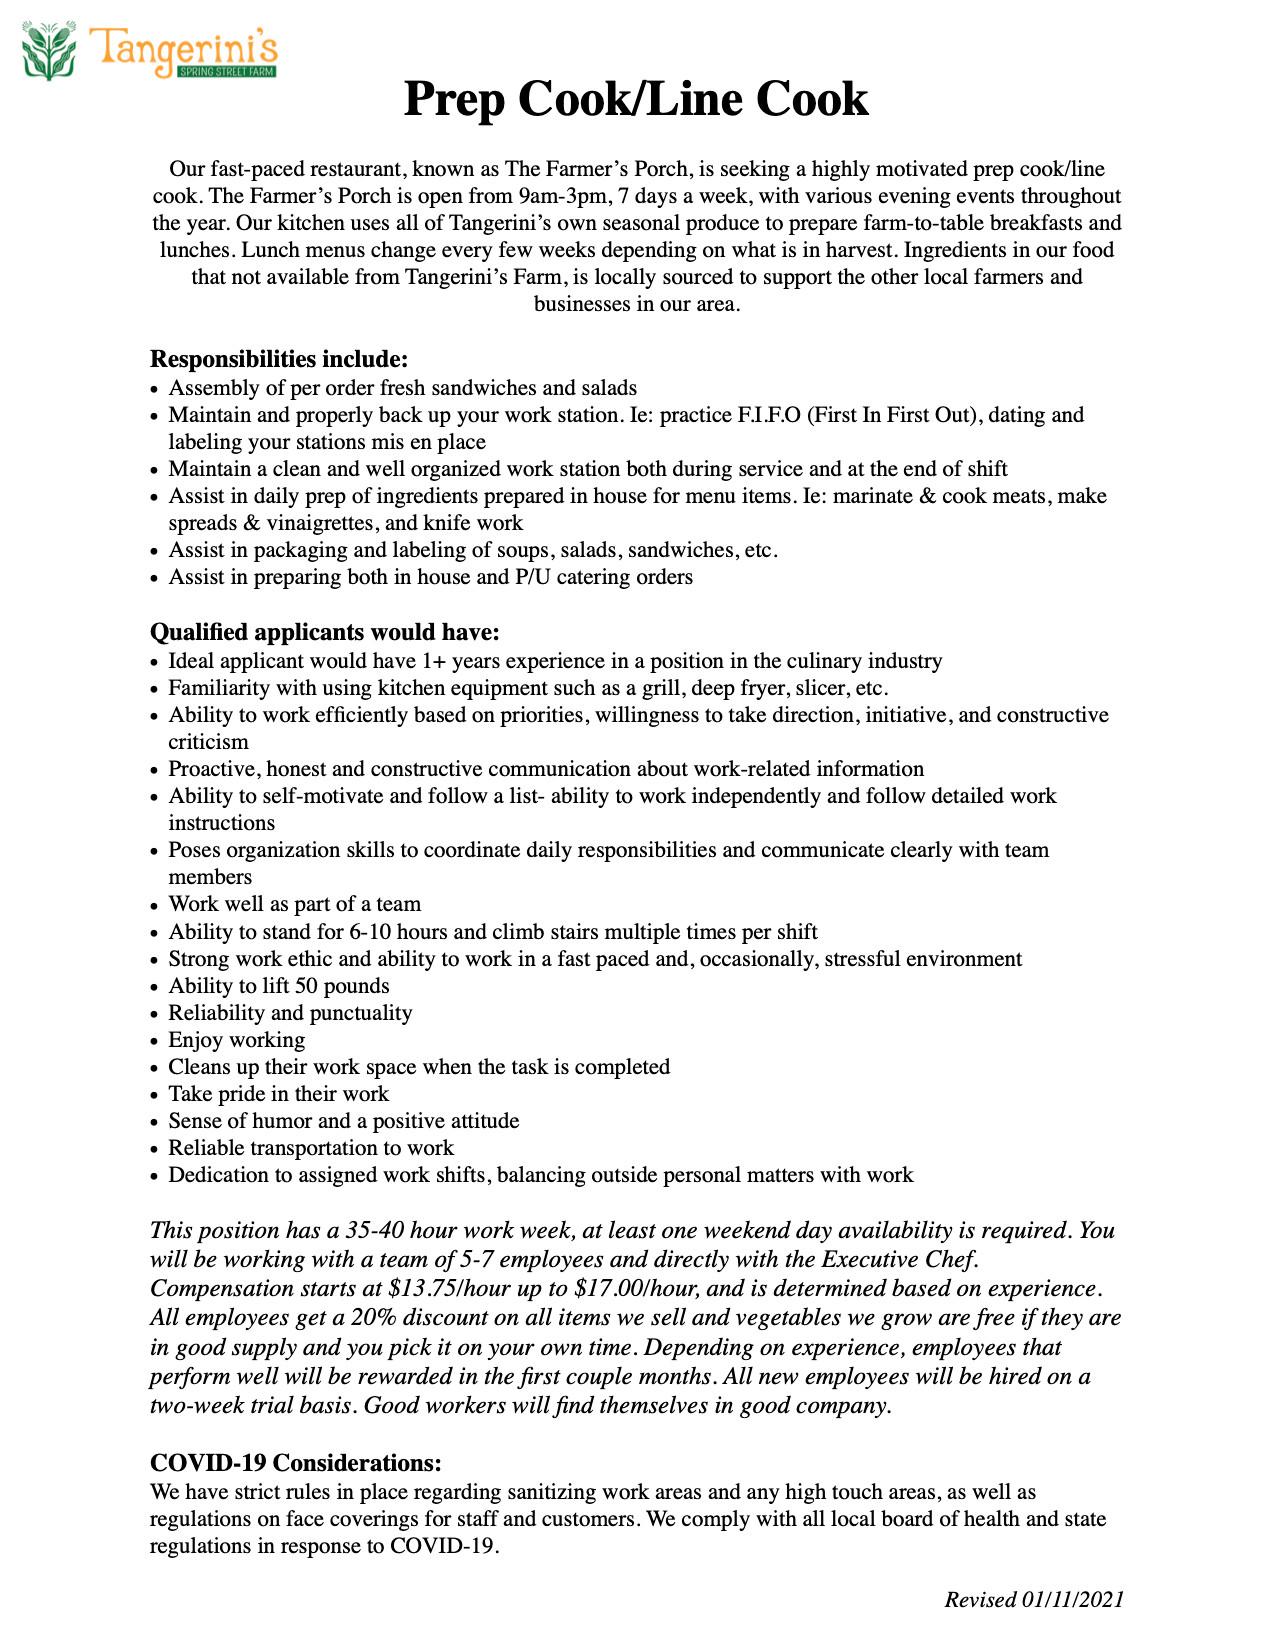 Linecook:Prep Cook Job Description .jpg